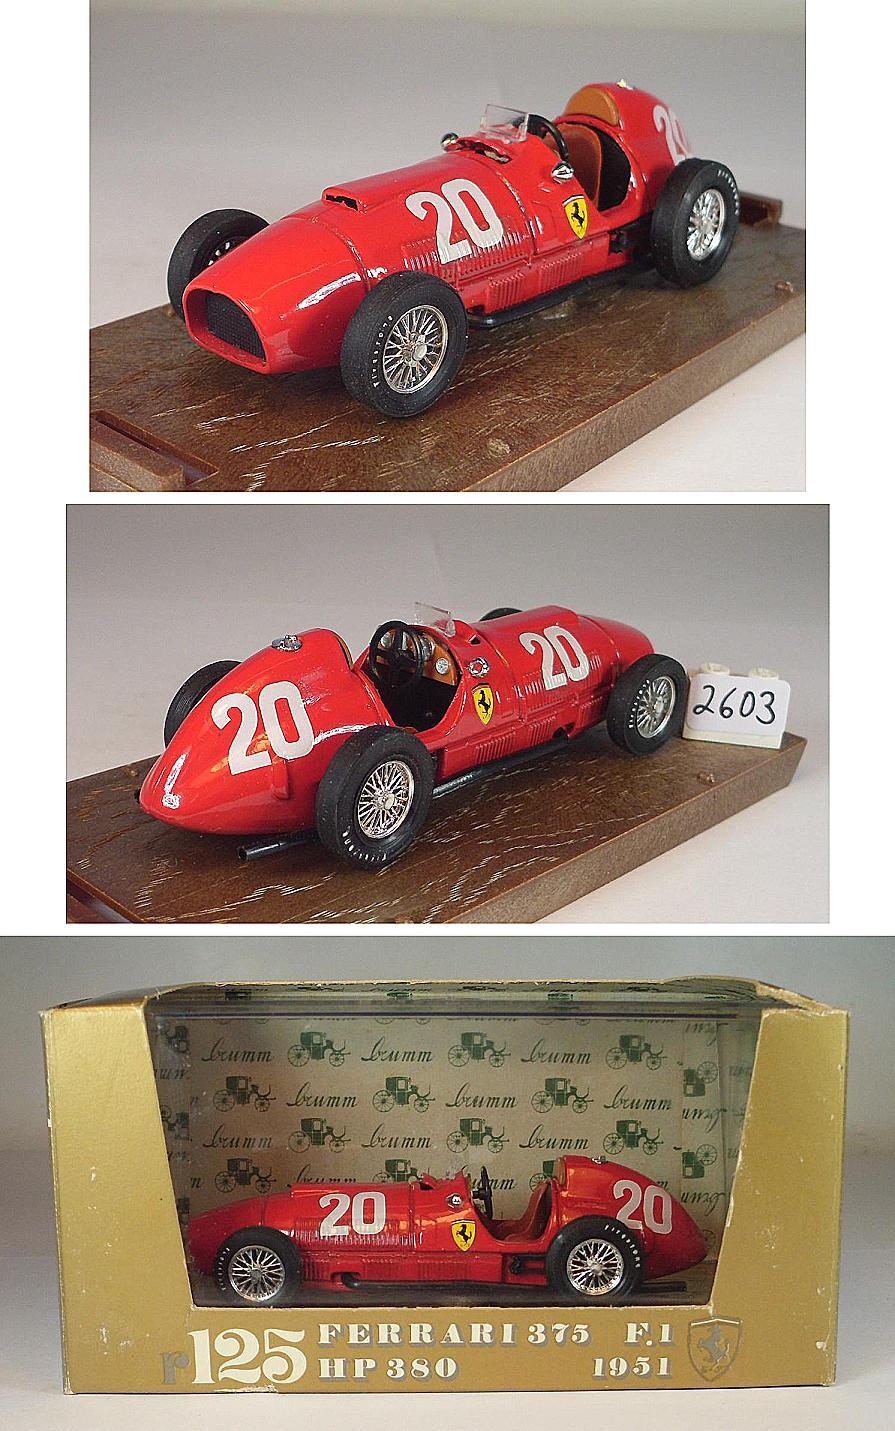 #87391 BoS-Models Ferrari  375 F1 #12 1951-1:87 F1 GP Silverstone